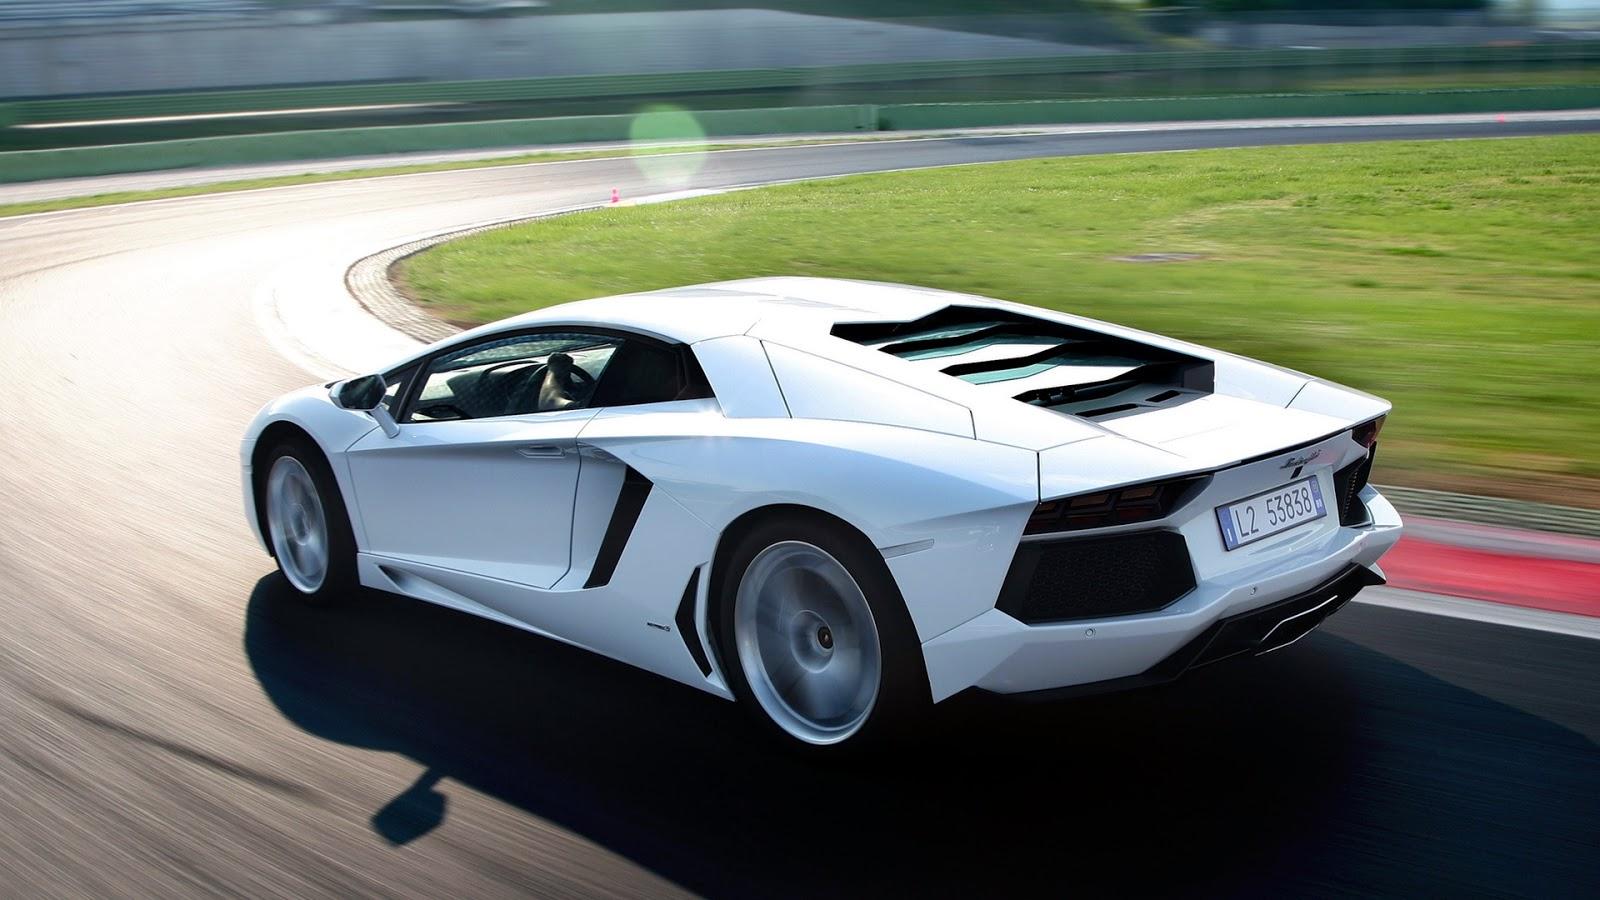 Luxury Lamborghini Cars Lamborghini Aventador Wallpaper